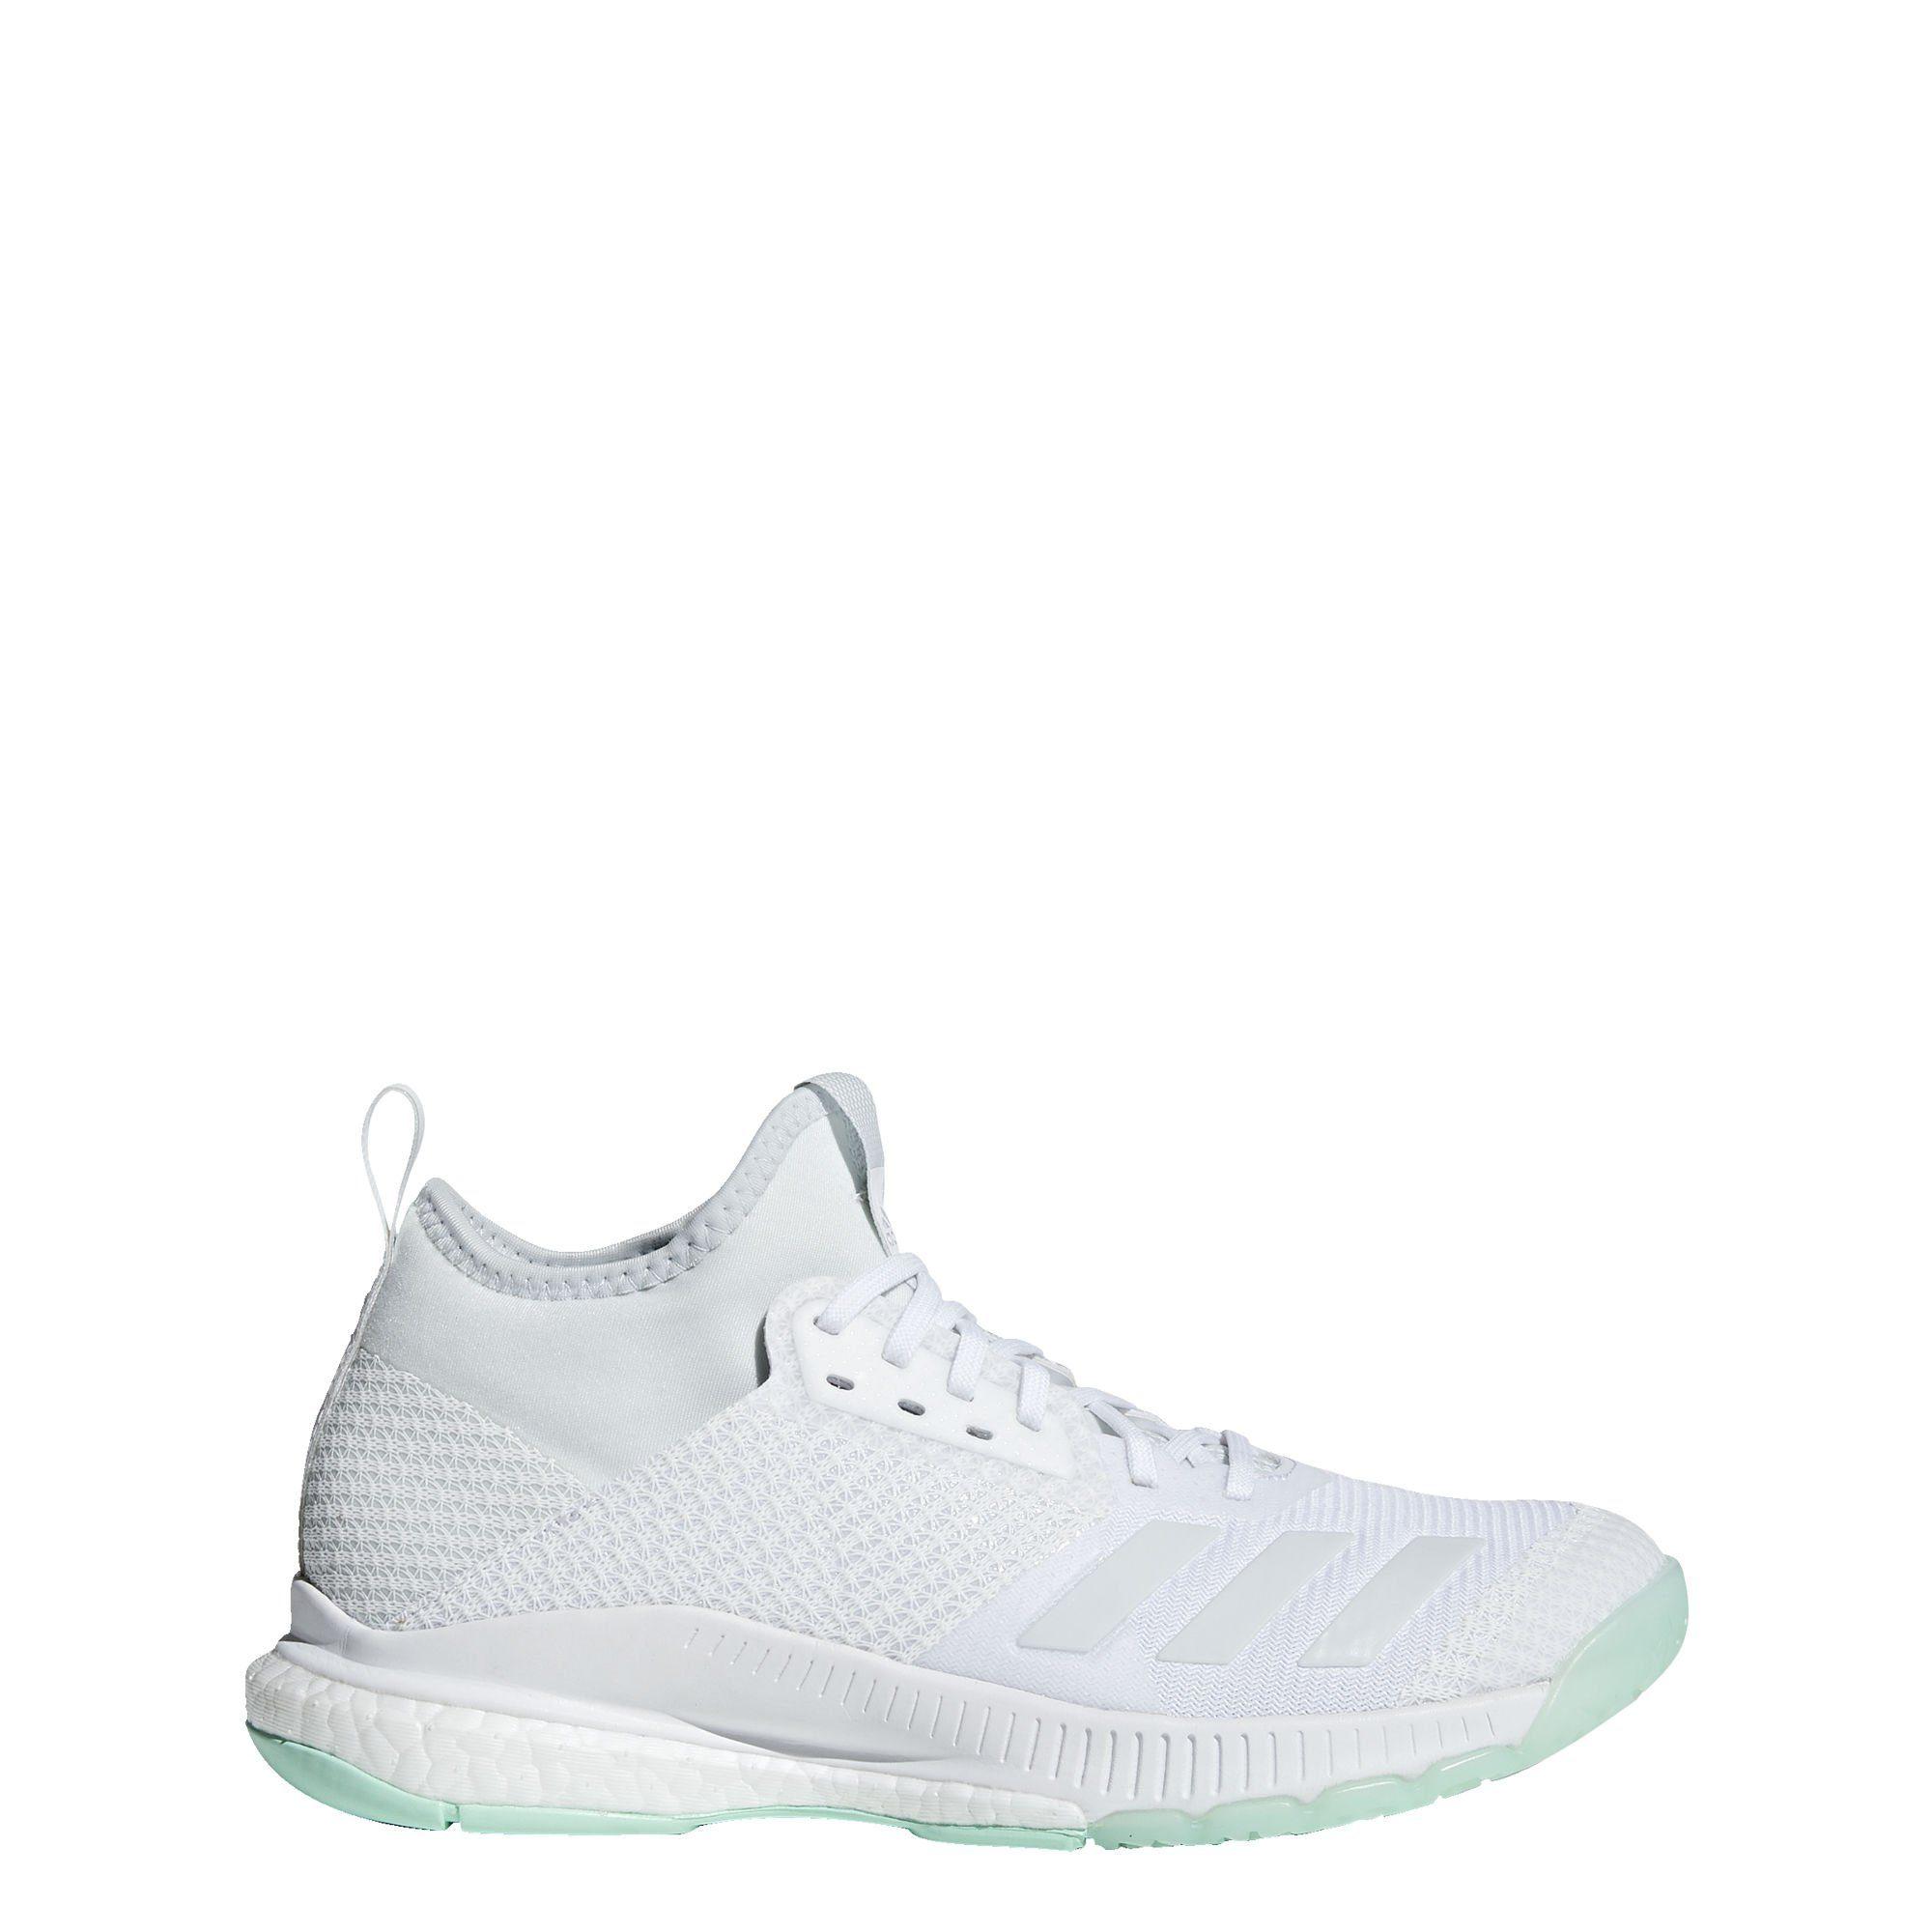 adidas Performance »Crazyflight X 2.0 Mid Schuh« Laufschuh UltraBoost  online kaufen | OTTO